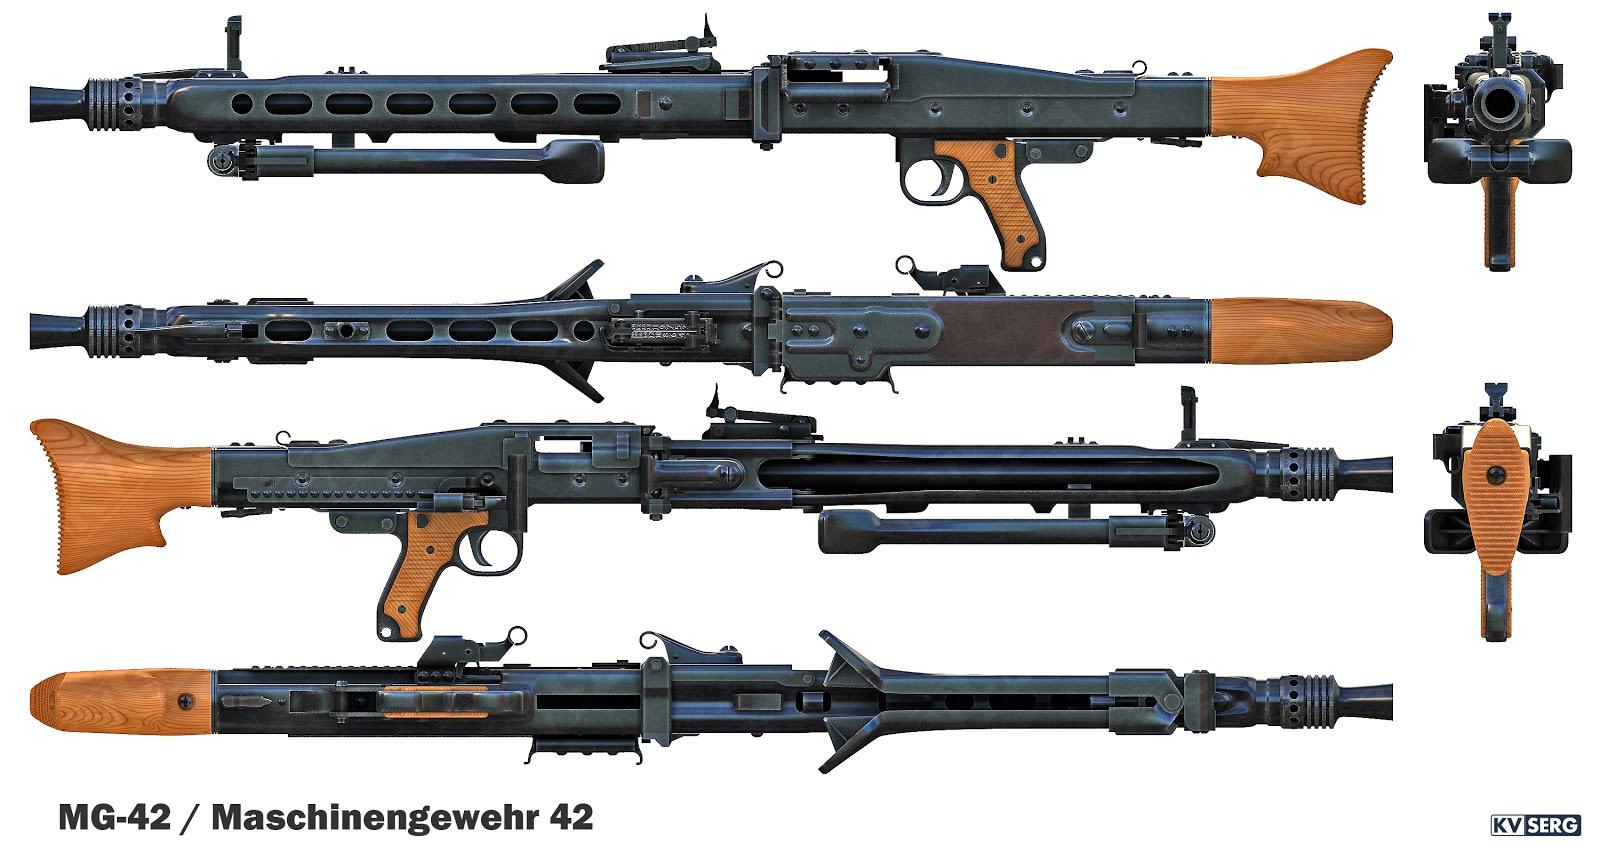 Maschinegewehr 42 Wallpaper: KVSERG ART: MG-42 / Maschinengewehr 42